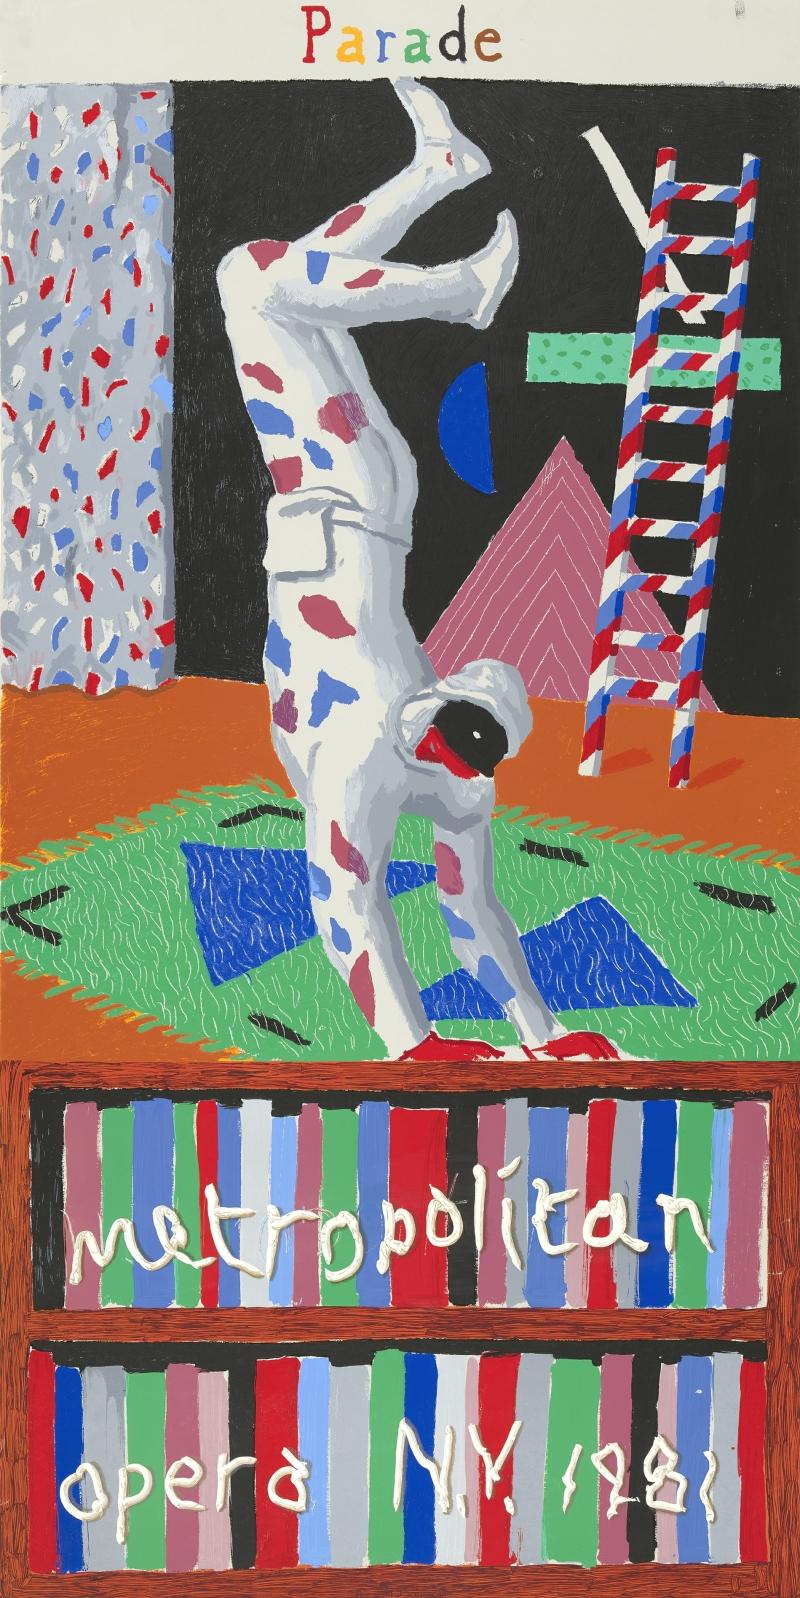 David Hockney (British, b. 1937), Parade, 1981, screenprint. Gift of the Friends of the McNay, McNay Art Museum, 1981.23